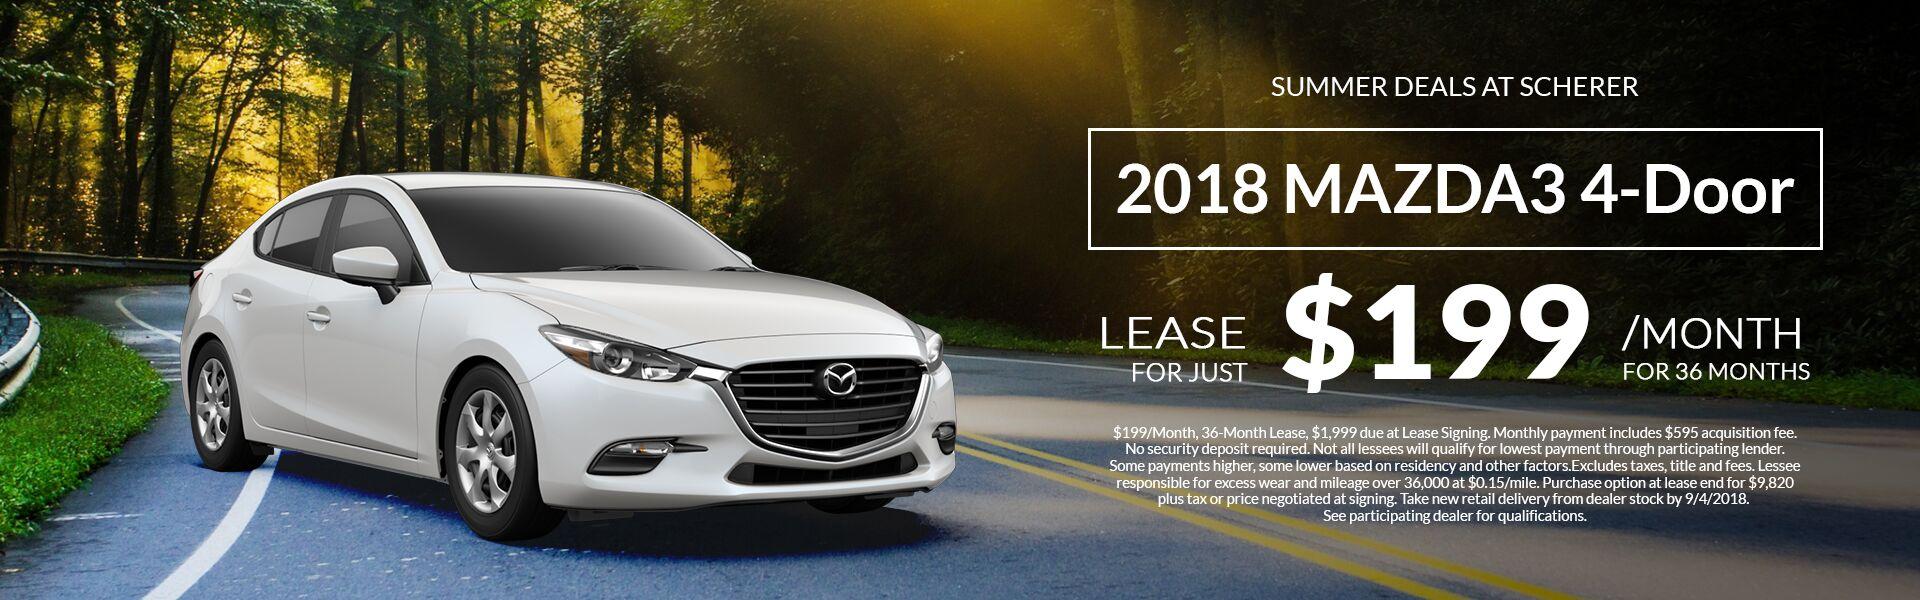 Car Dealerships In Peoria Il >> Mazda Dealership Peoria IL | Used Cars Scherer Mazda